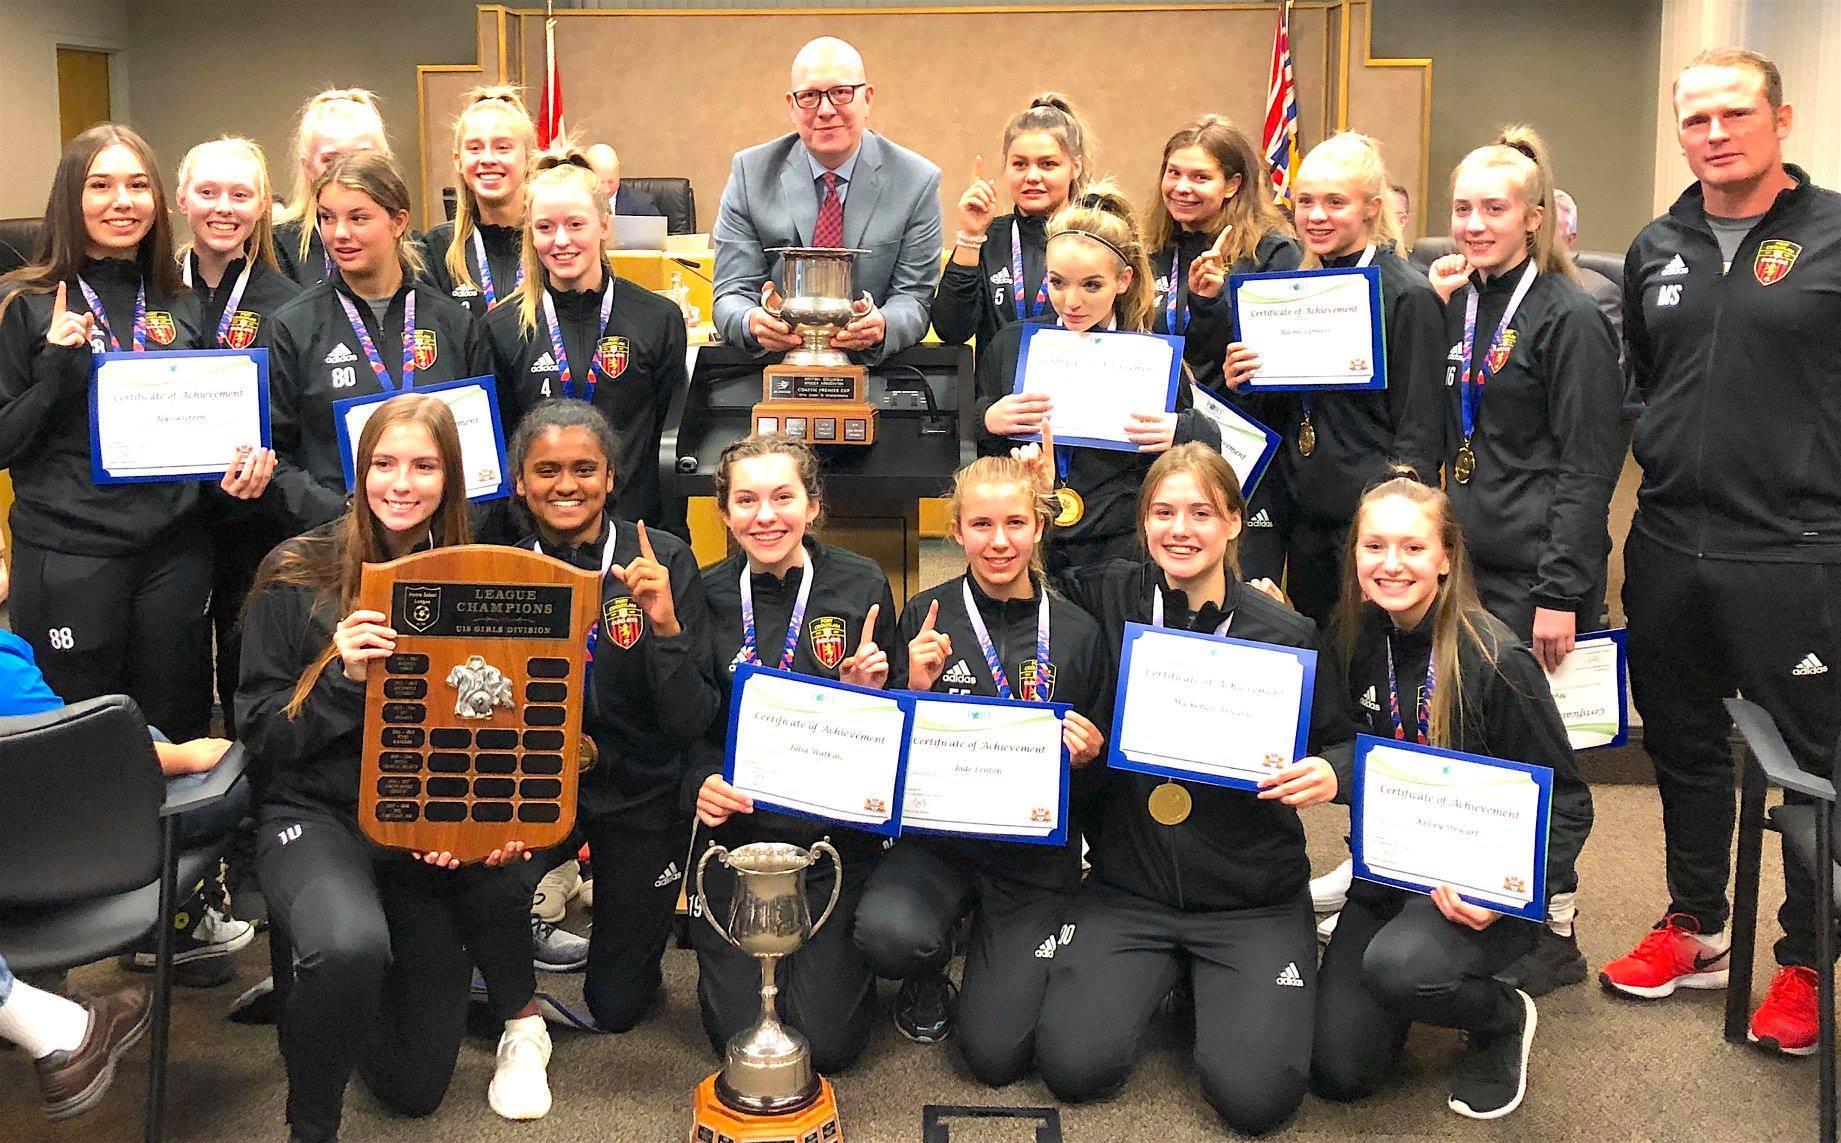 PoCo Euro-Rite FC – U15 Honoured by City Council